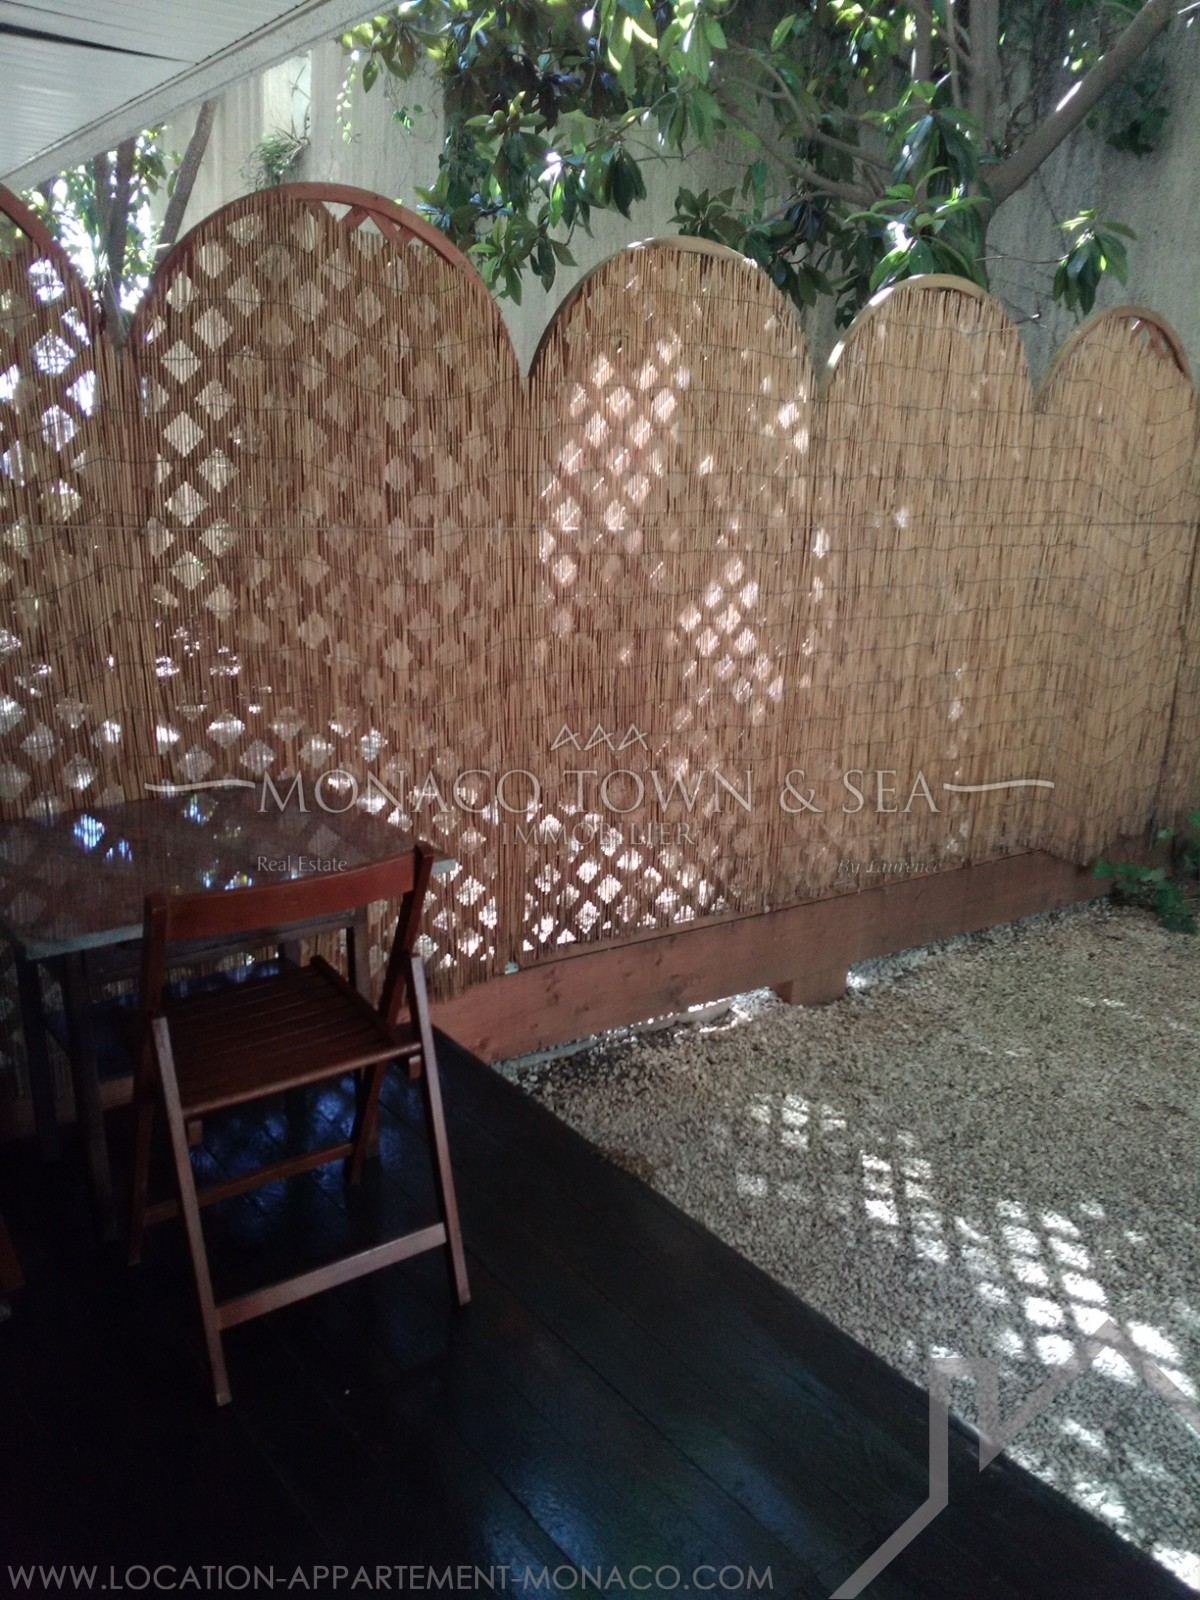 Studio meuble avec jardin a louer location d 39 appartements monaco - Appartement a louer avec jardin ...